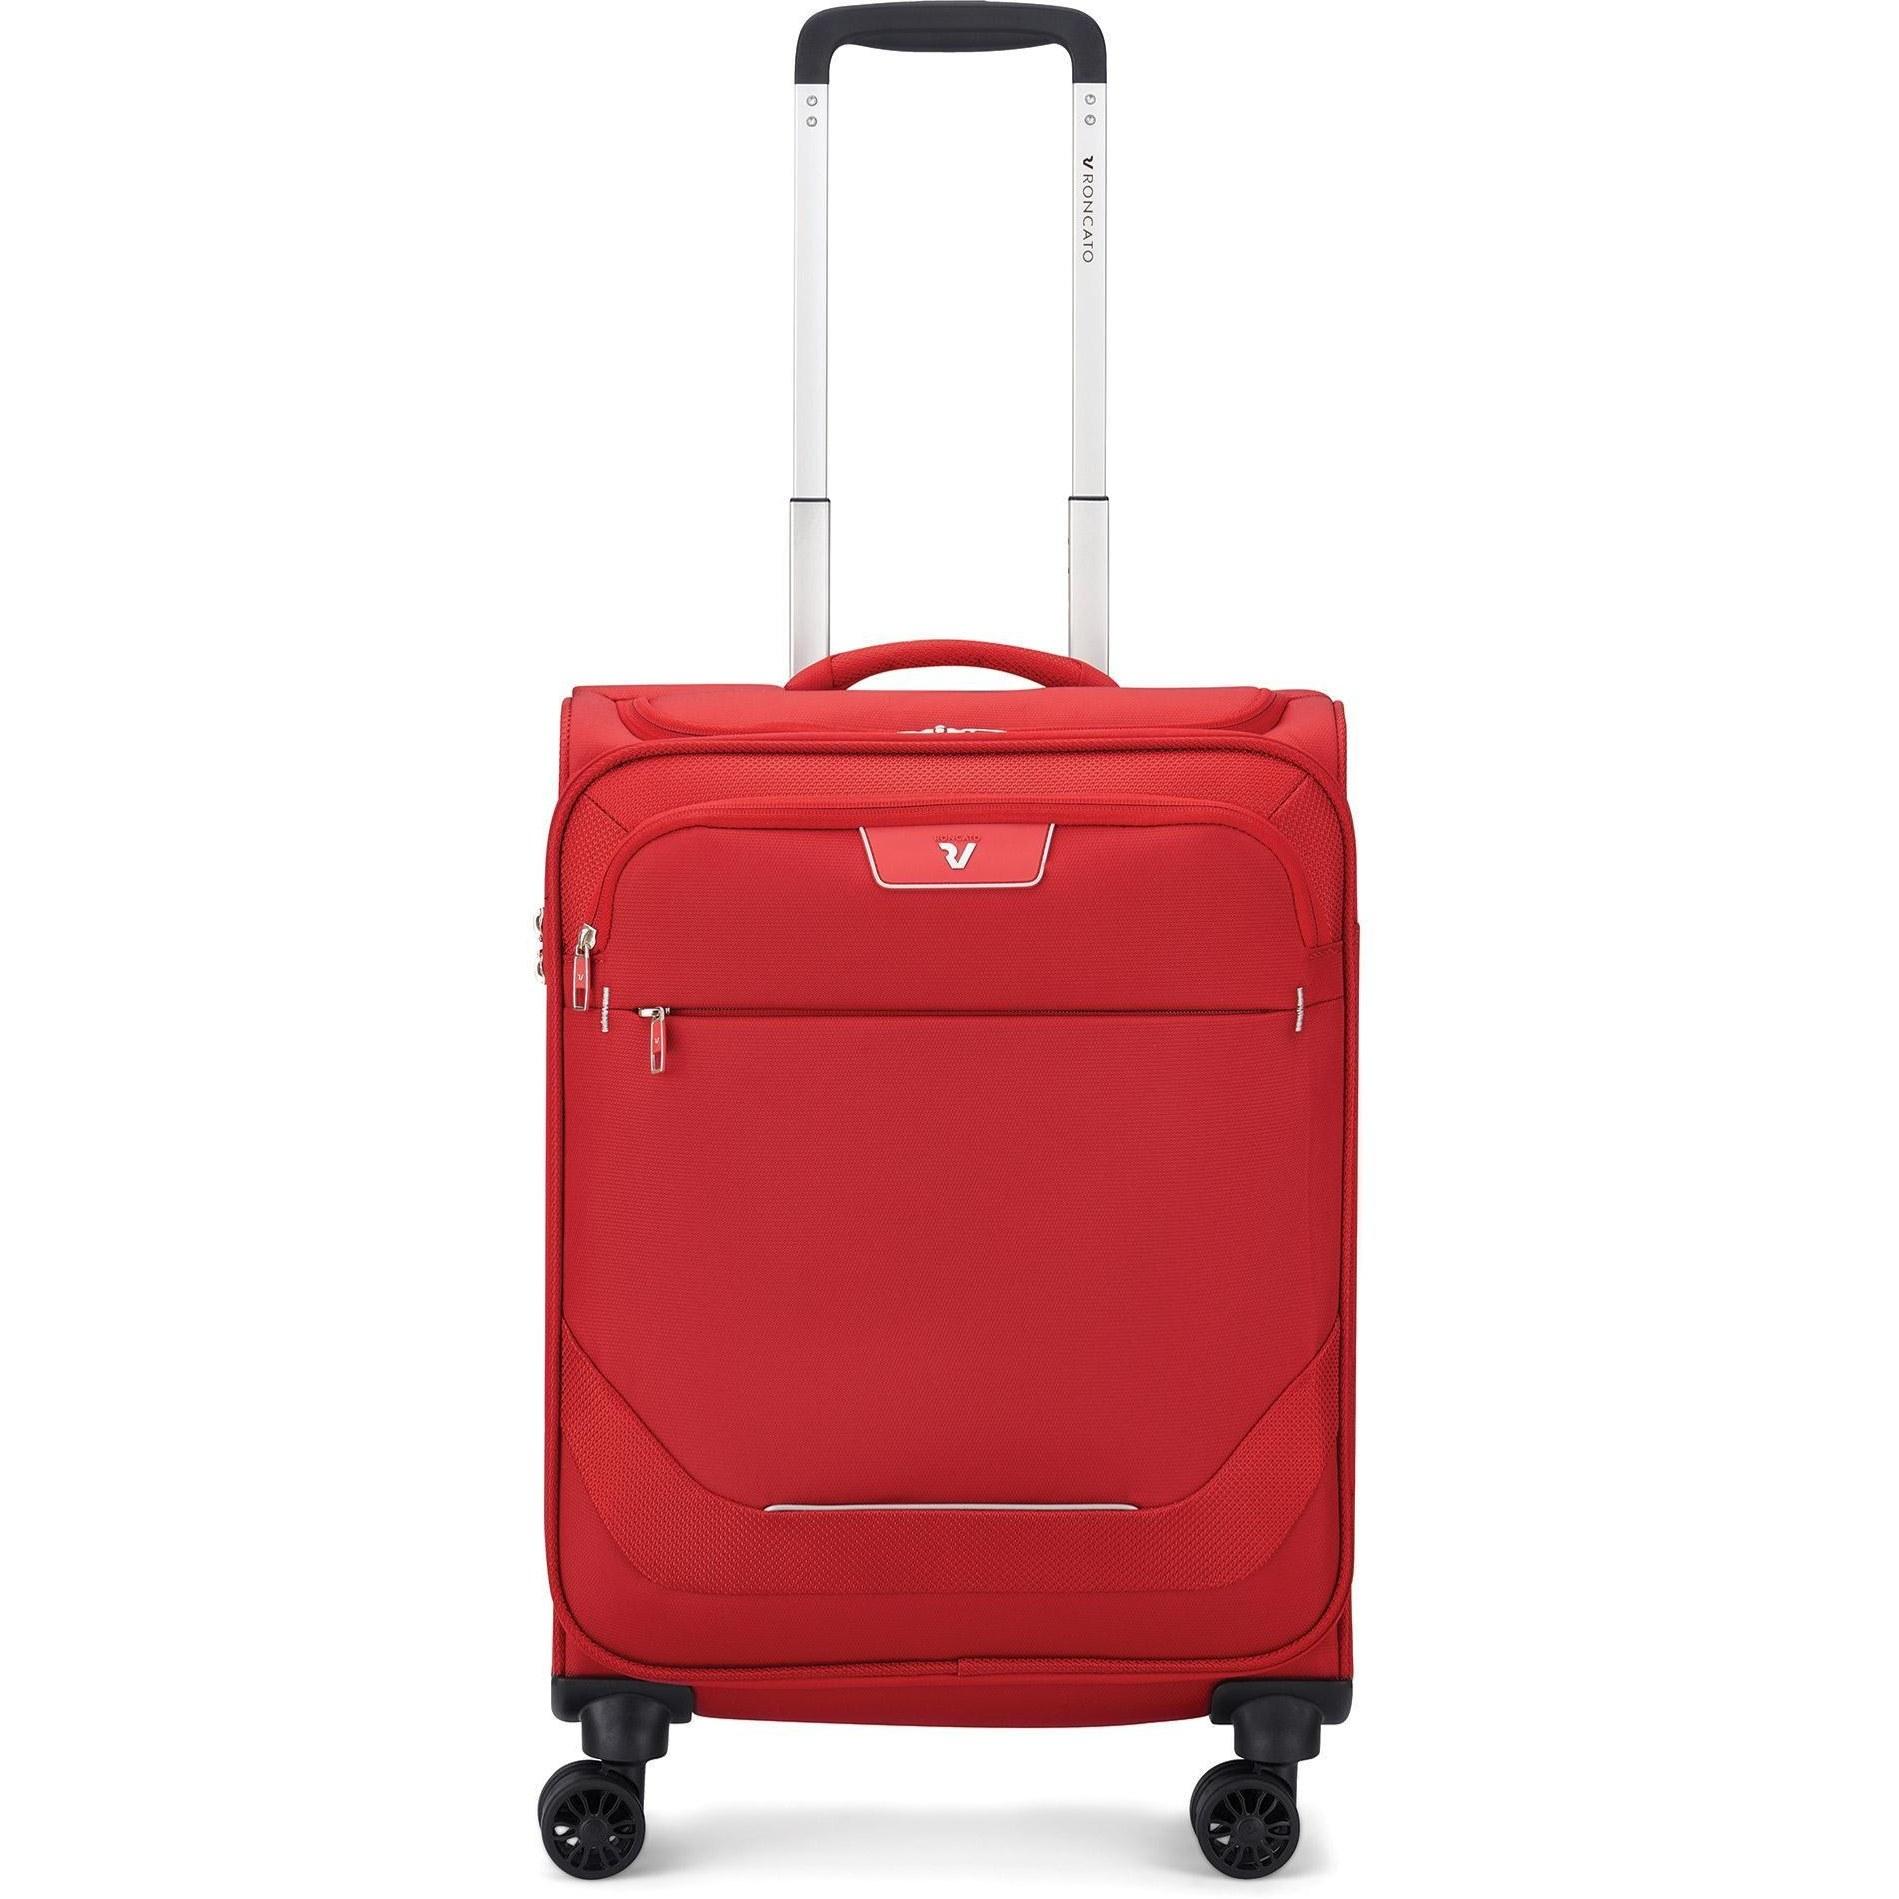 عکس چمدان رونکاتو مدل جوی سایز کابین قرمز  چمدان-رونکاتو-مدل-جوی-سایز-کابین-قرمز